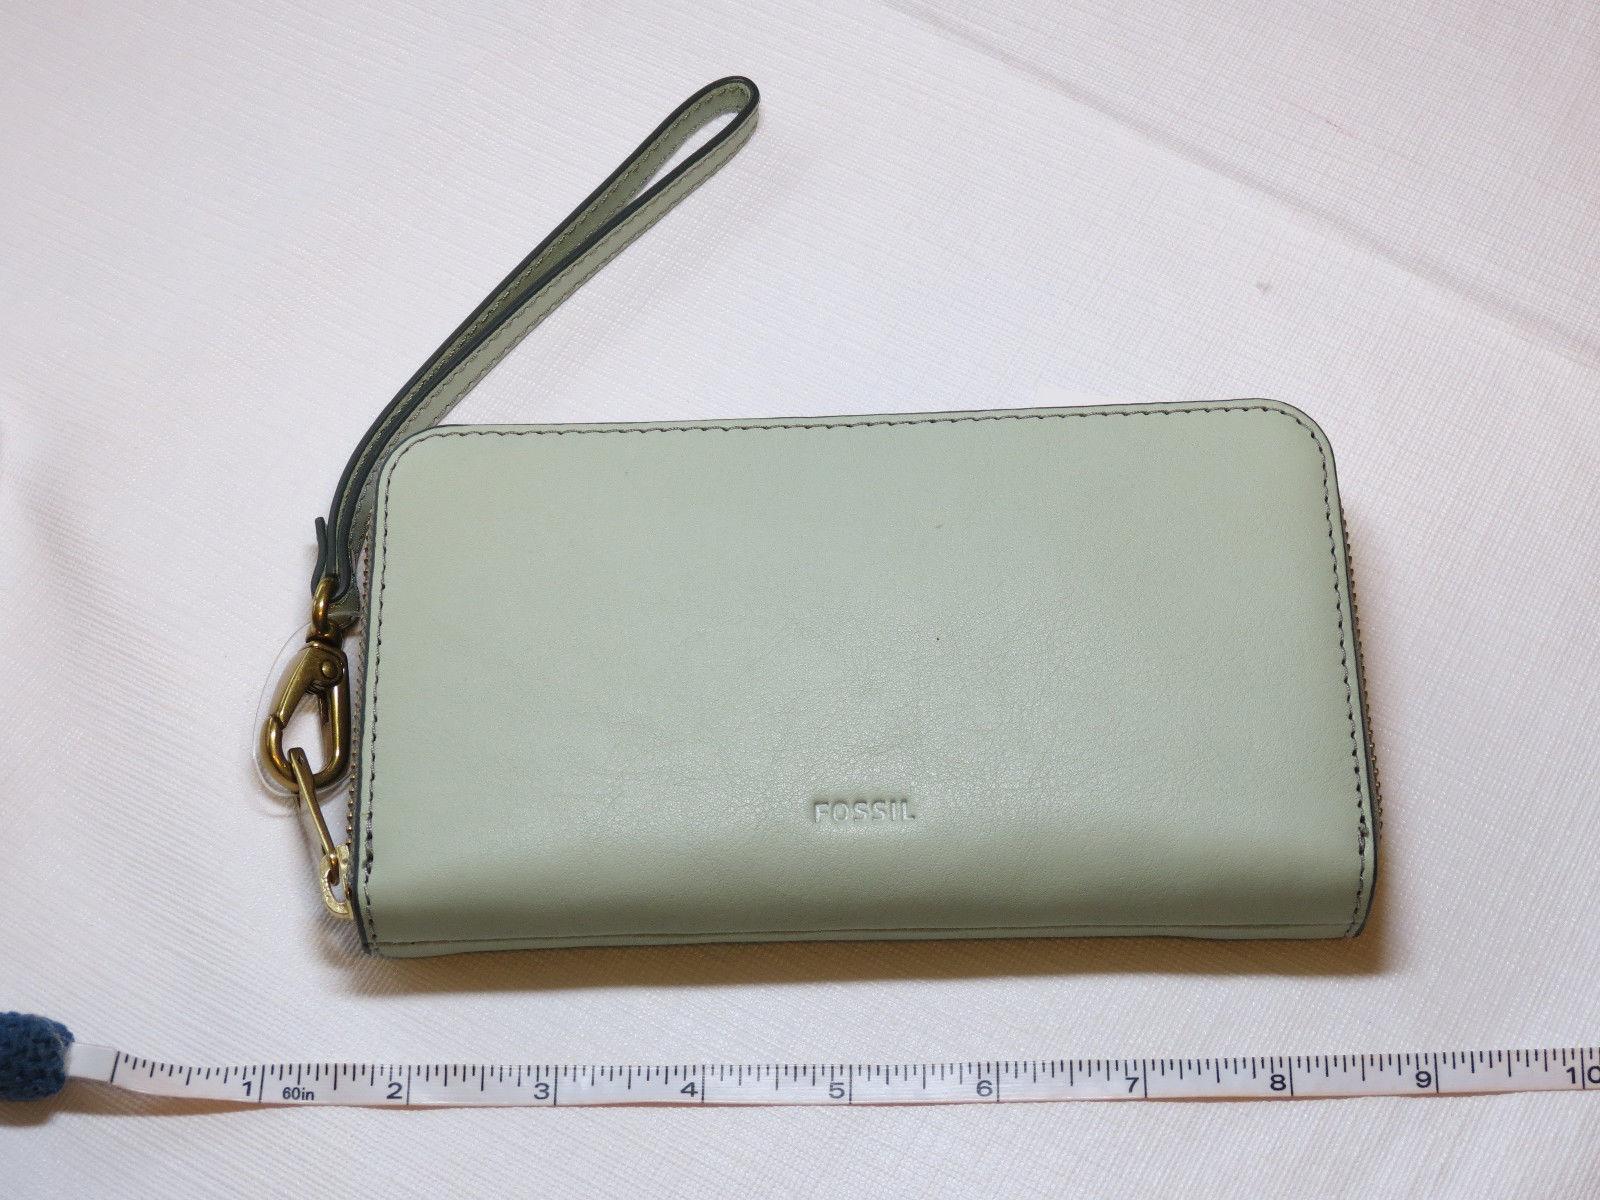 Fossil SL7151336 RFID Emma Smartphone Wristlet Lght Sage wallet clutch leather*^